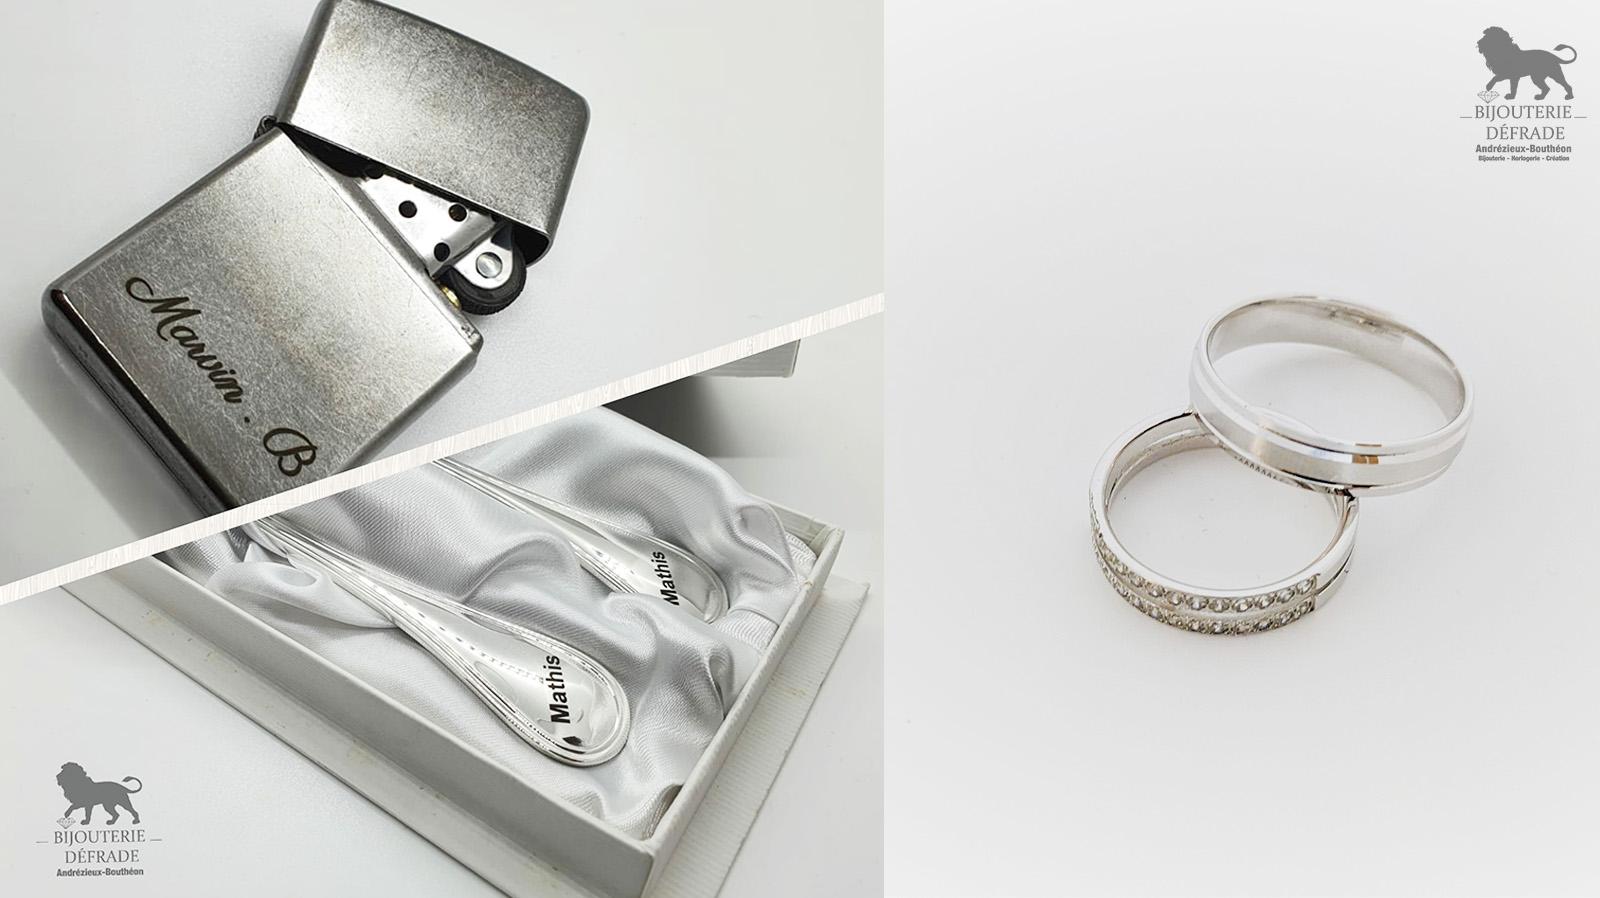 gravure de bijou et objet